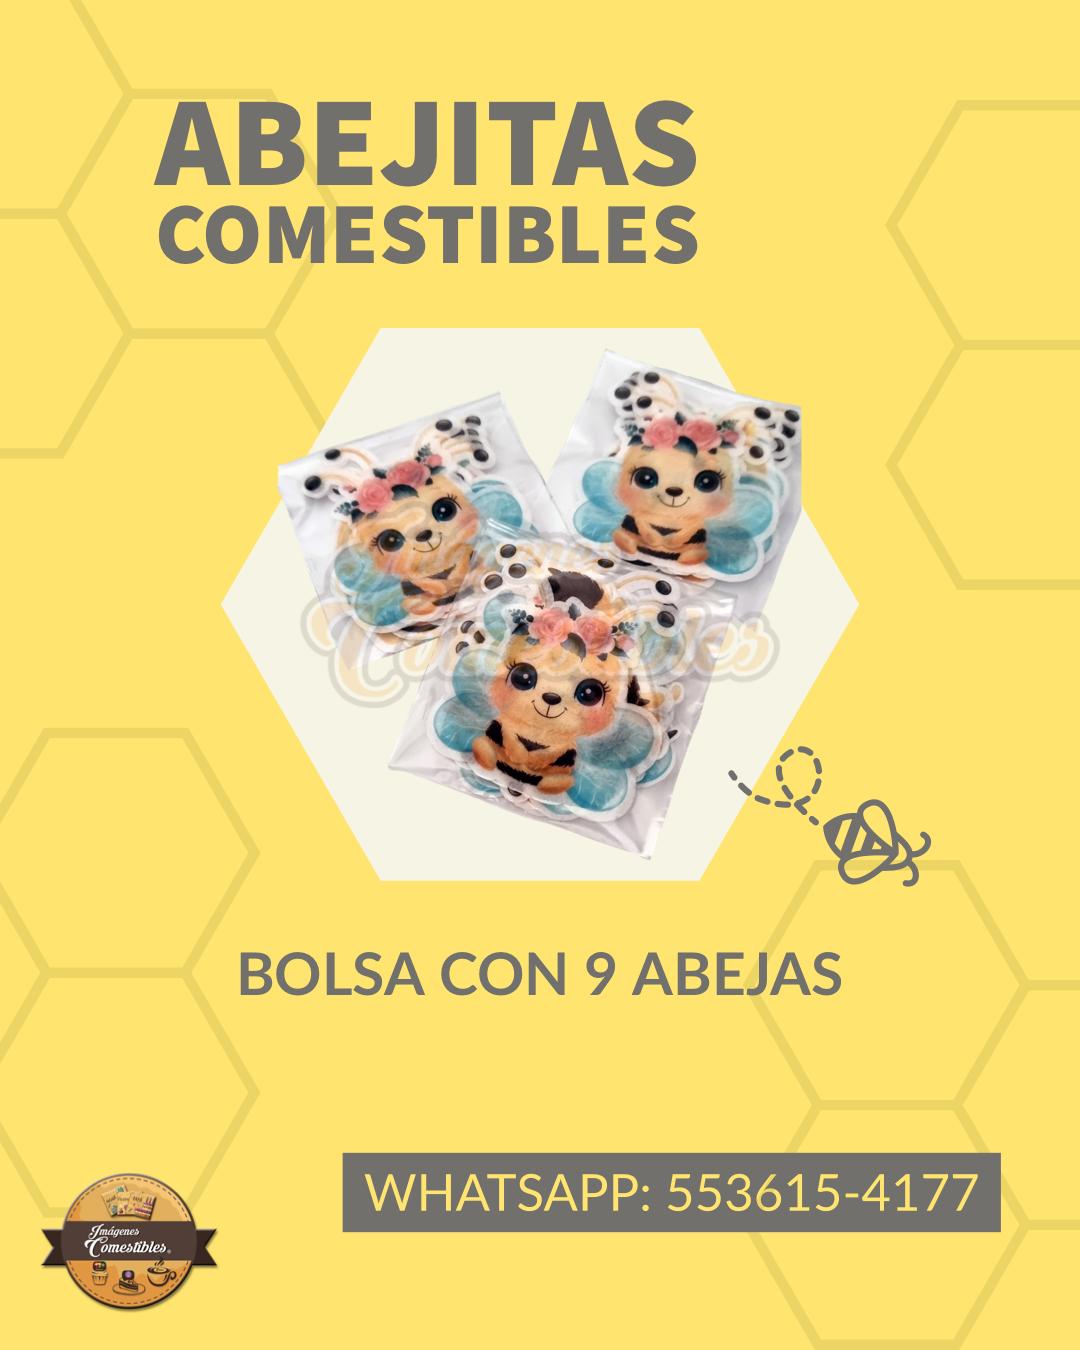 https://0201.nccdn.net/1_2/000/000/10a/b77/abejitas-comestibles-bolsa-con-9-julio-2021-.png